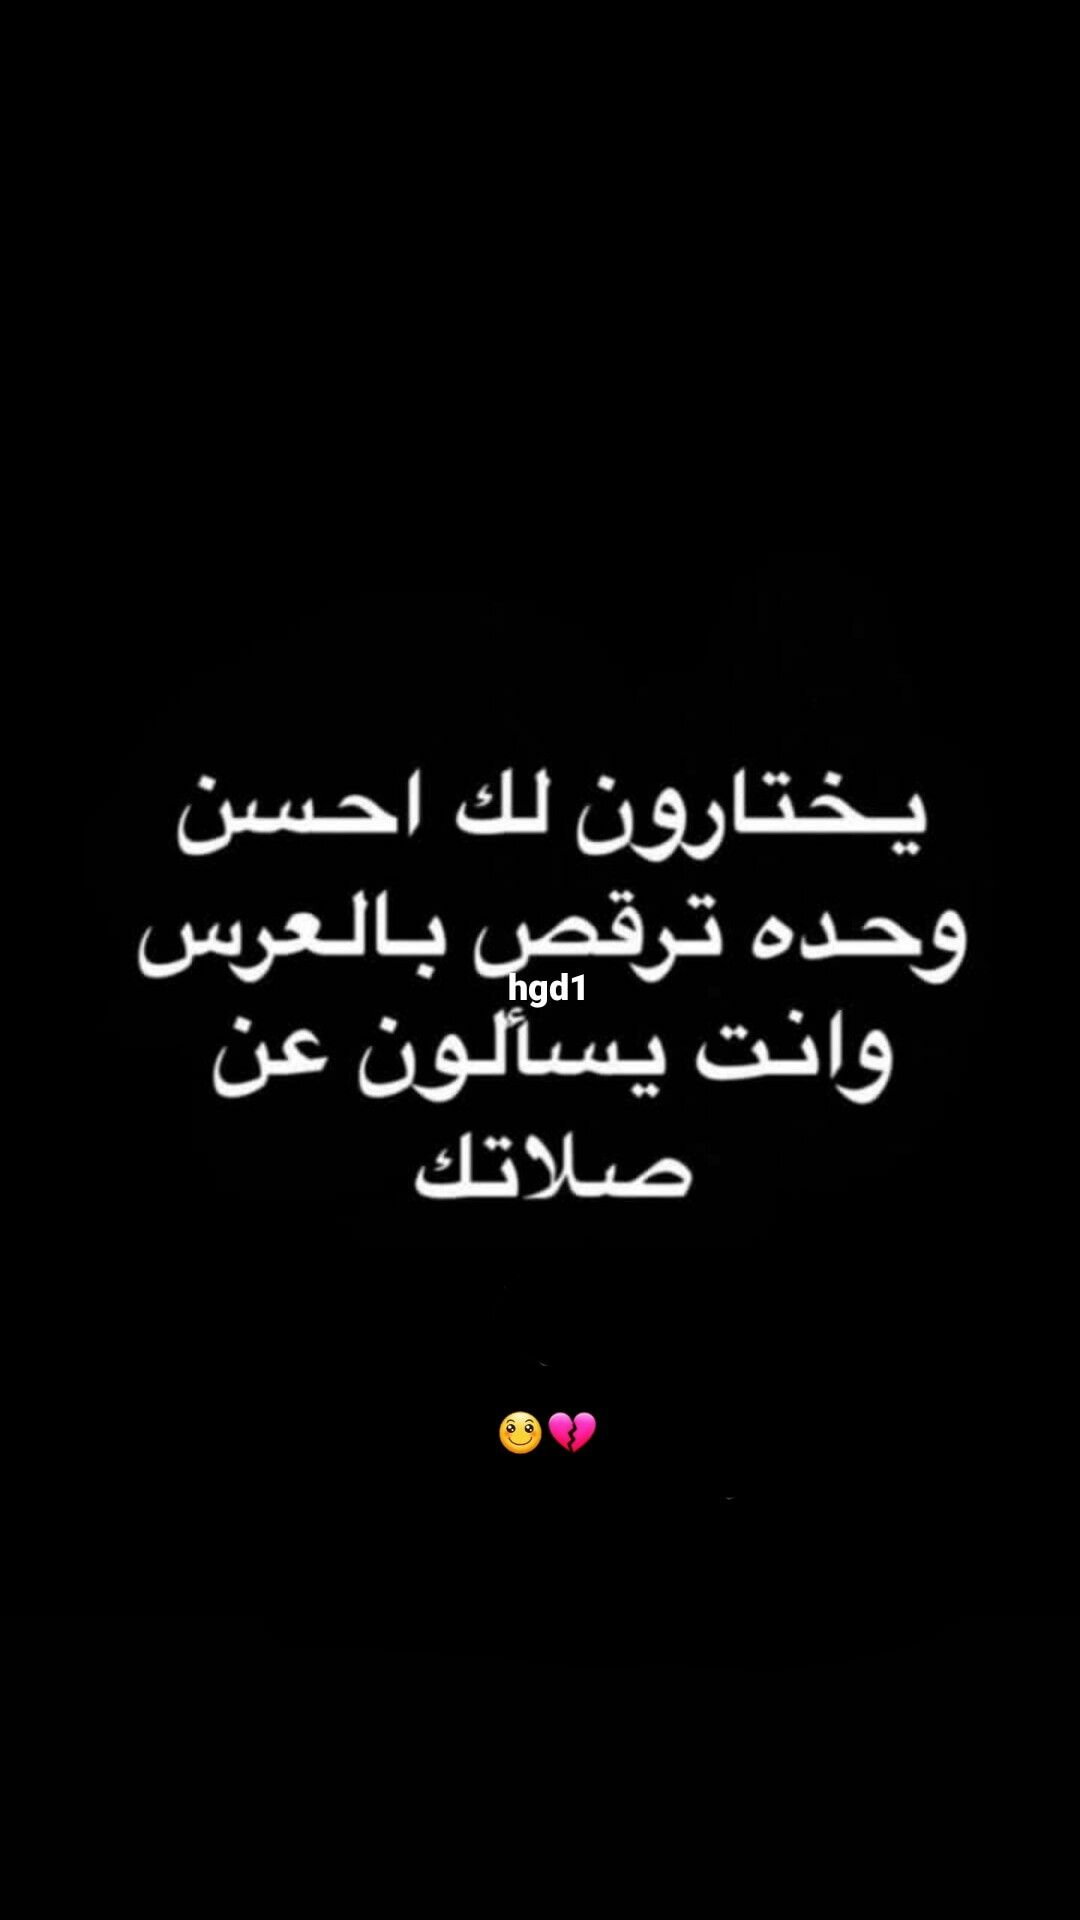 Pin By Sarah Yahya On Arabic Quotes Tumblr Funny Arabic Quotes Funny Words Funny Quotes